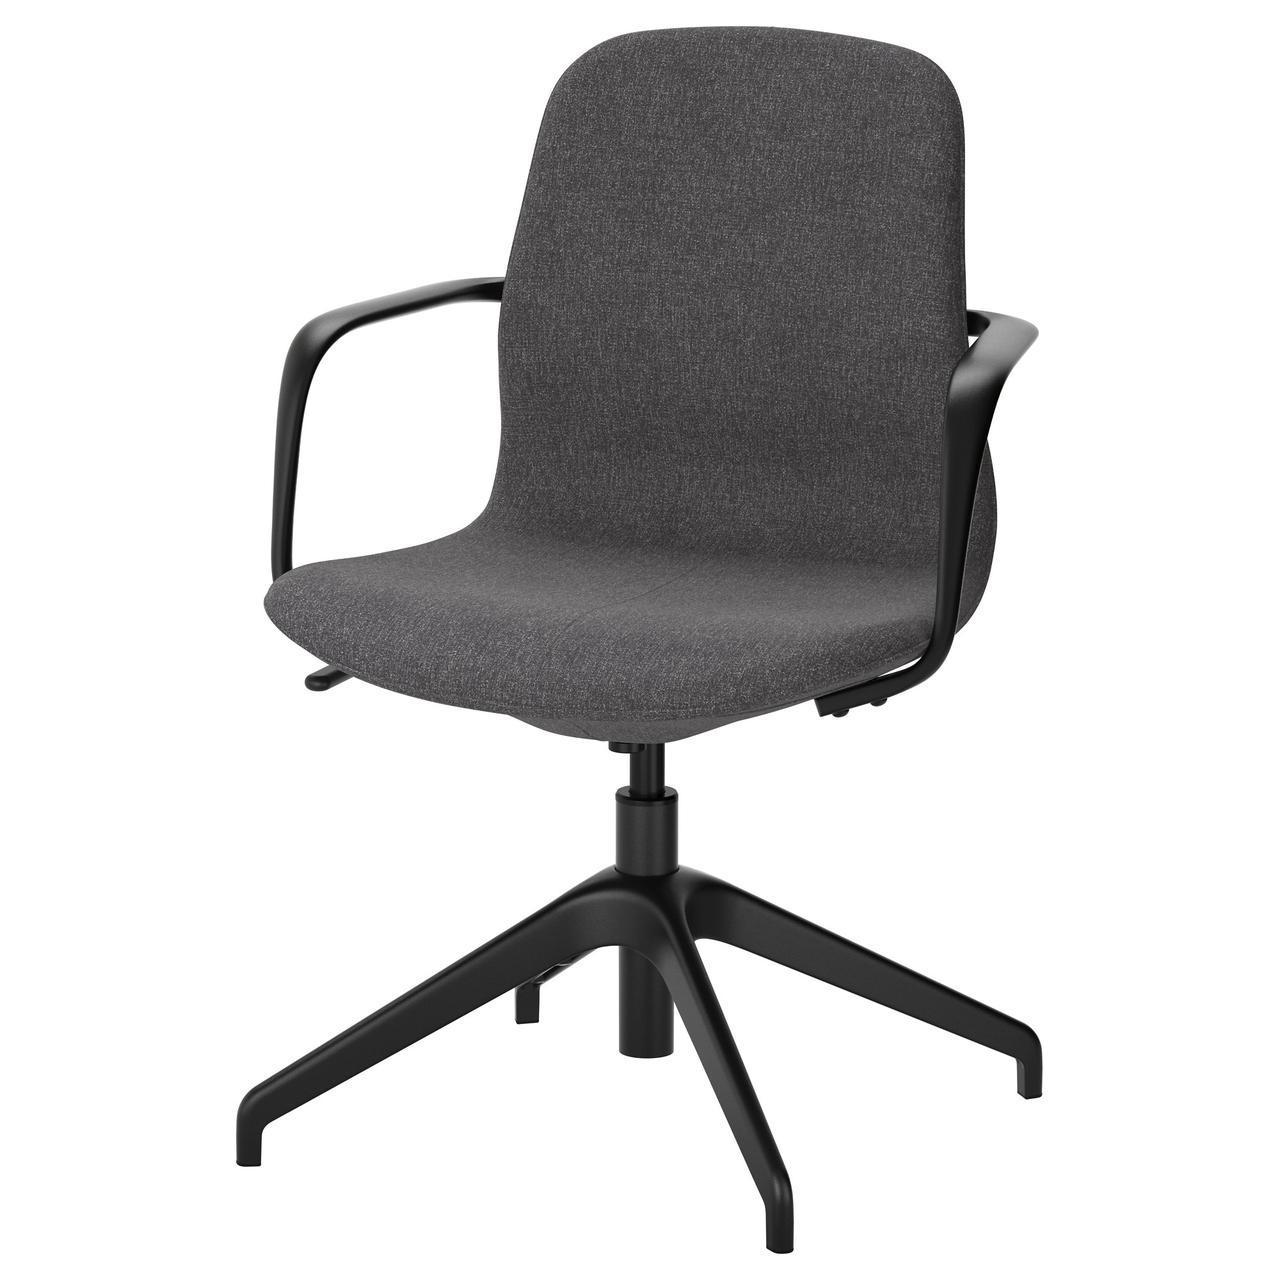 Комп'ютерне крісло IKEA LÅNGFJÄLL Gunnared темно-сіре чорне 991.762.22